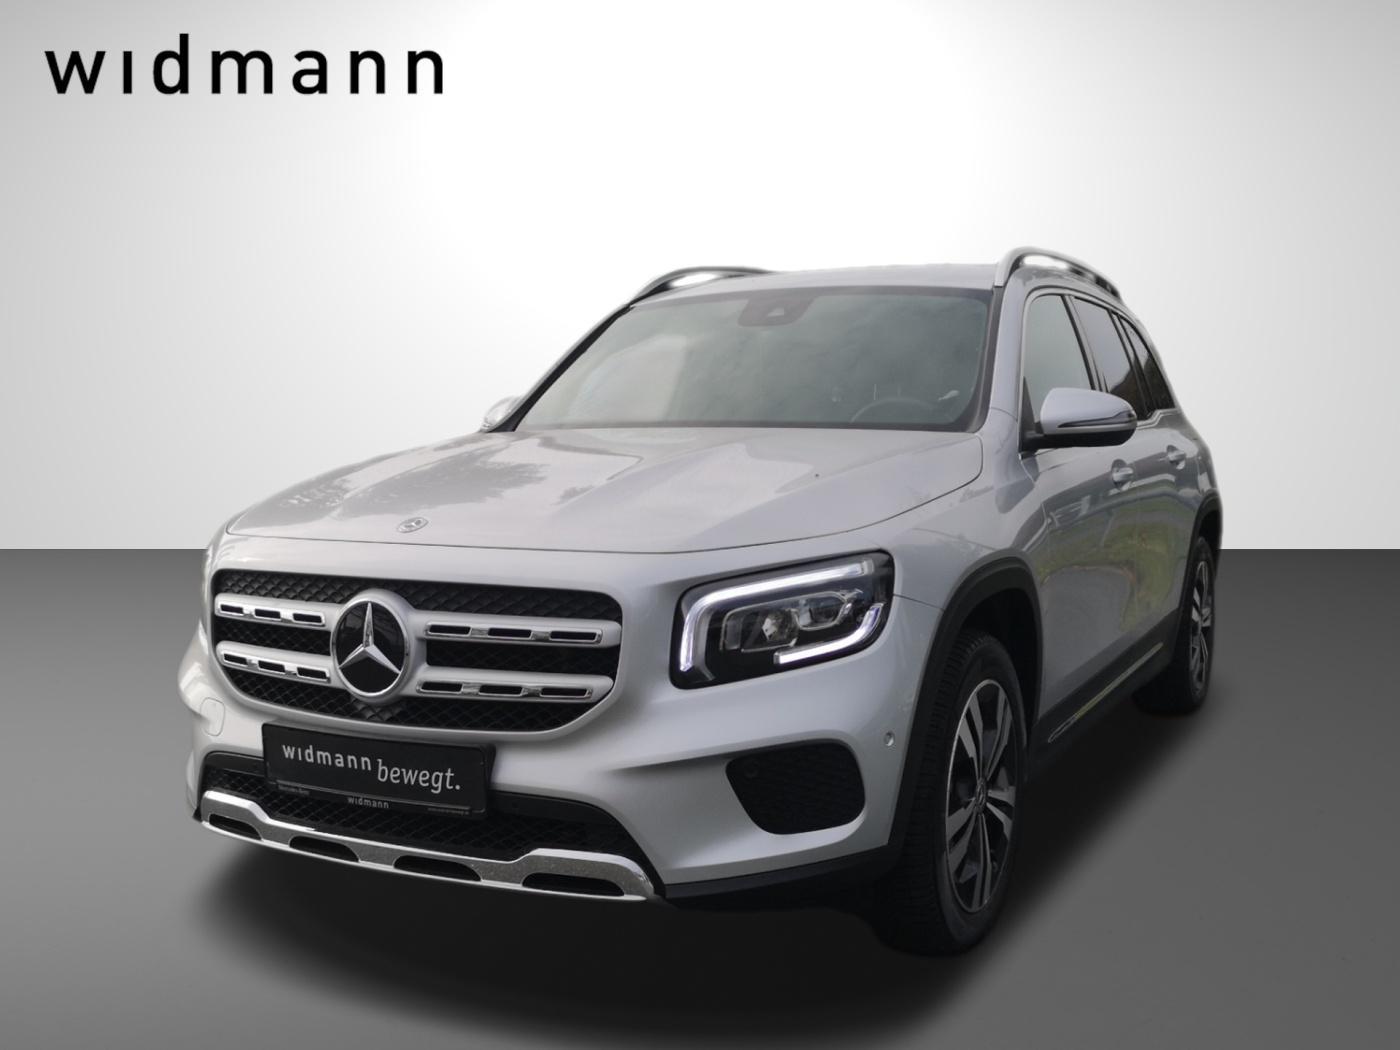 Mercedes-Benz GLB 180 d *Progressive*Navi*MBUX*LED*8G-DCT*PDC*, Jahr 2020, Diesel